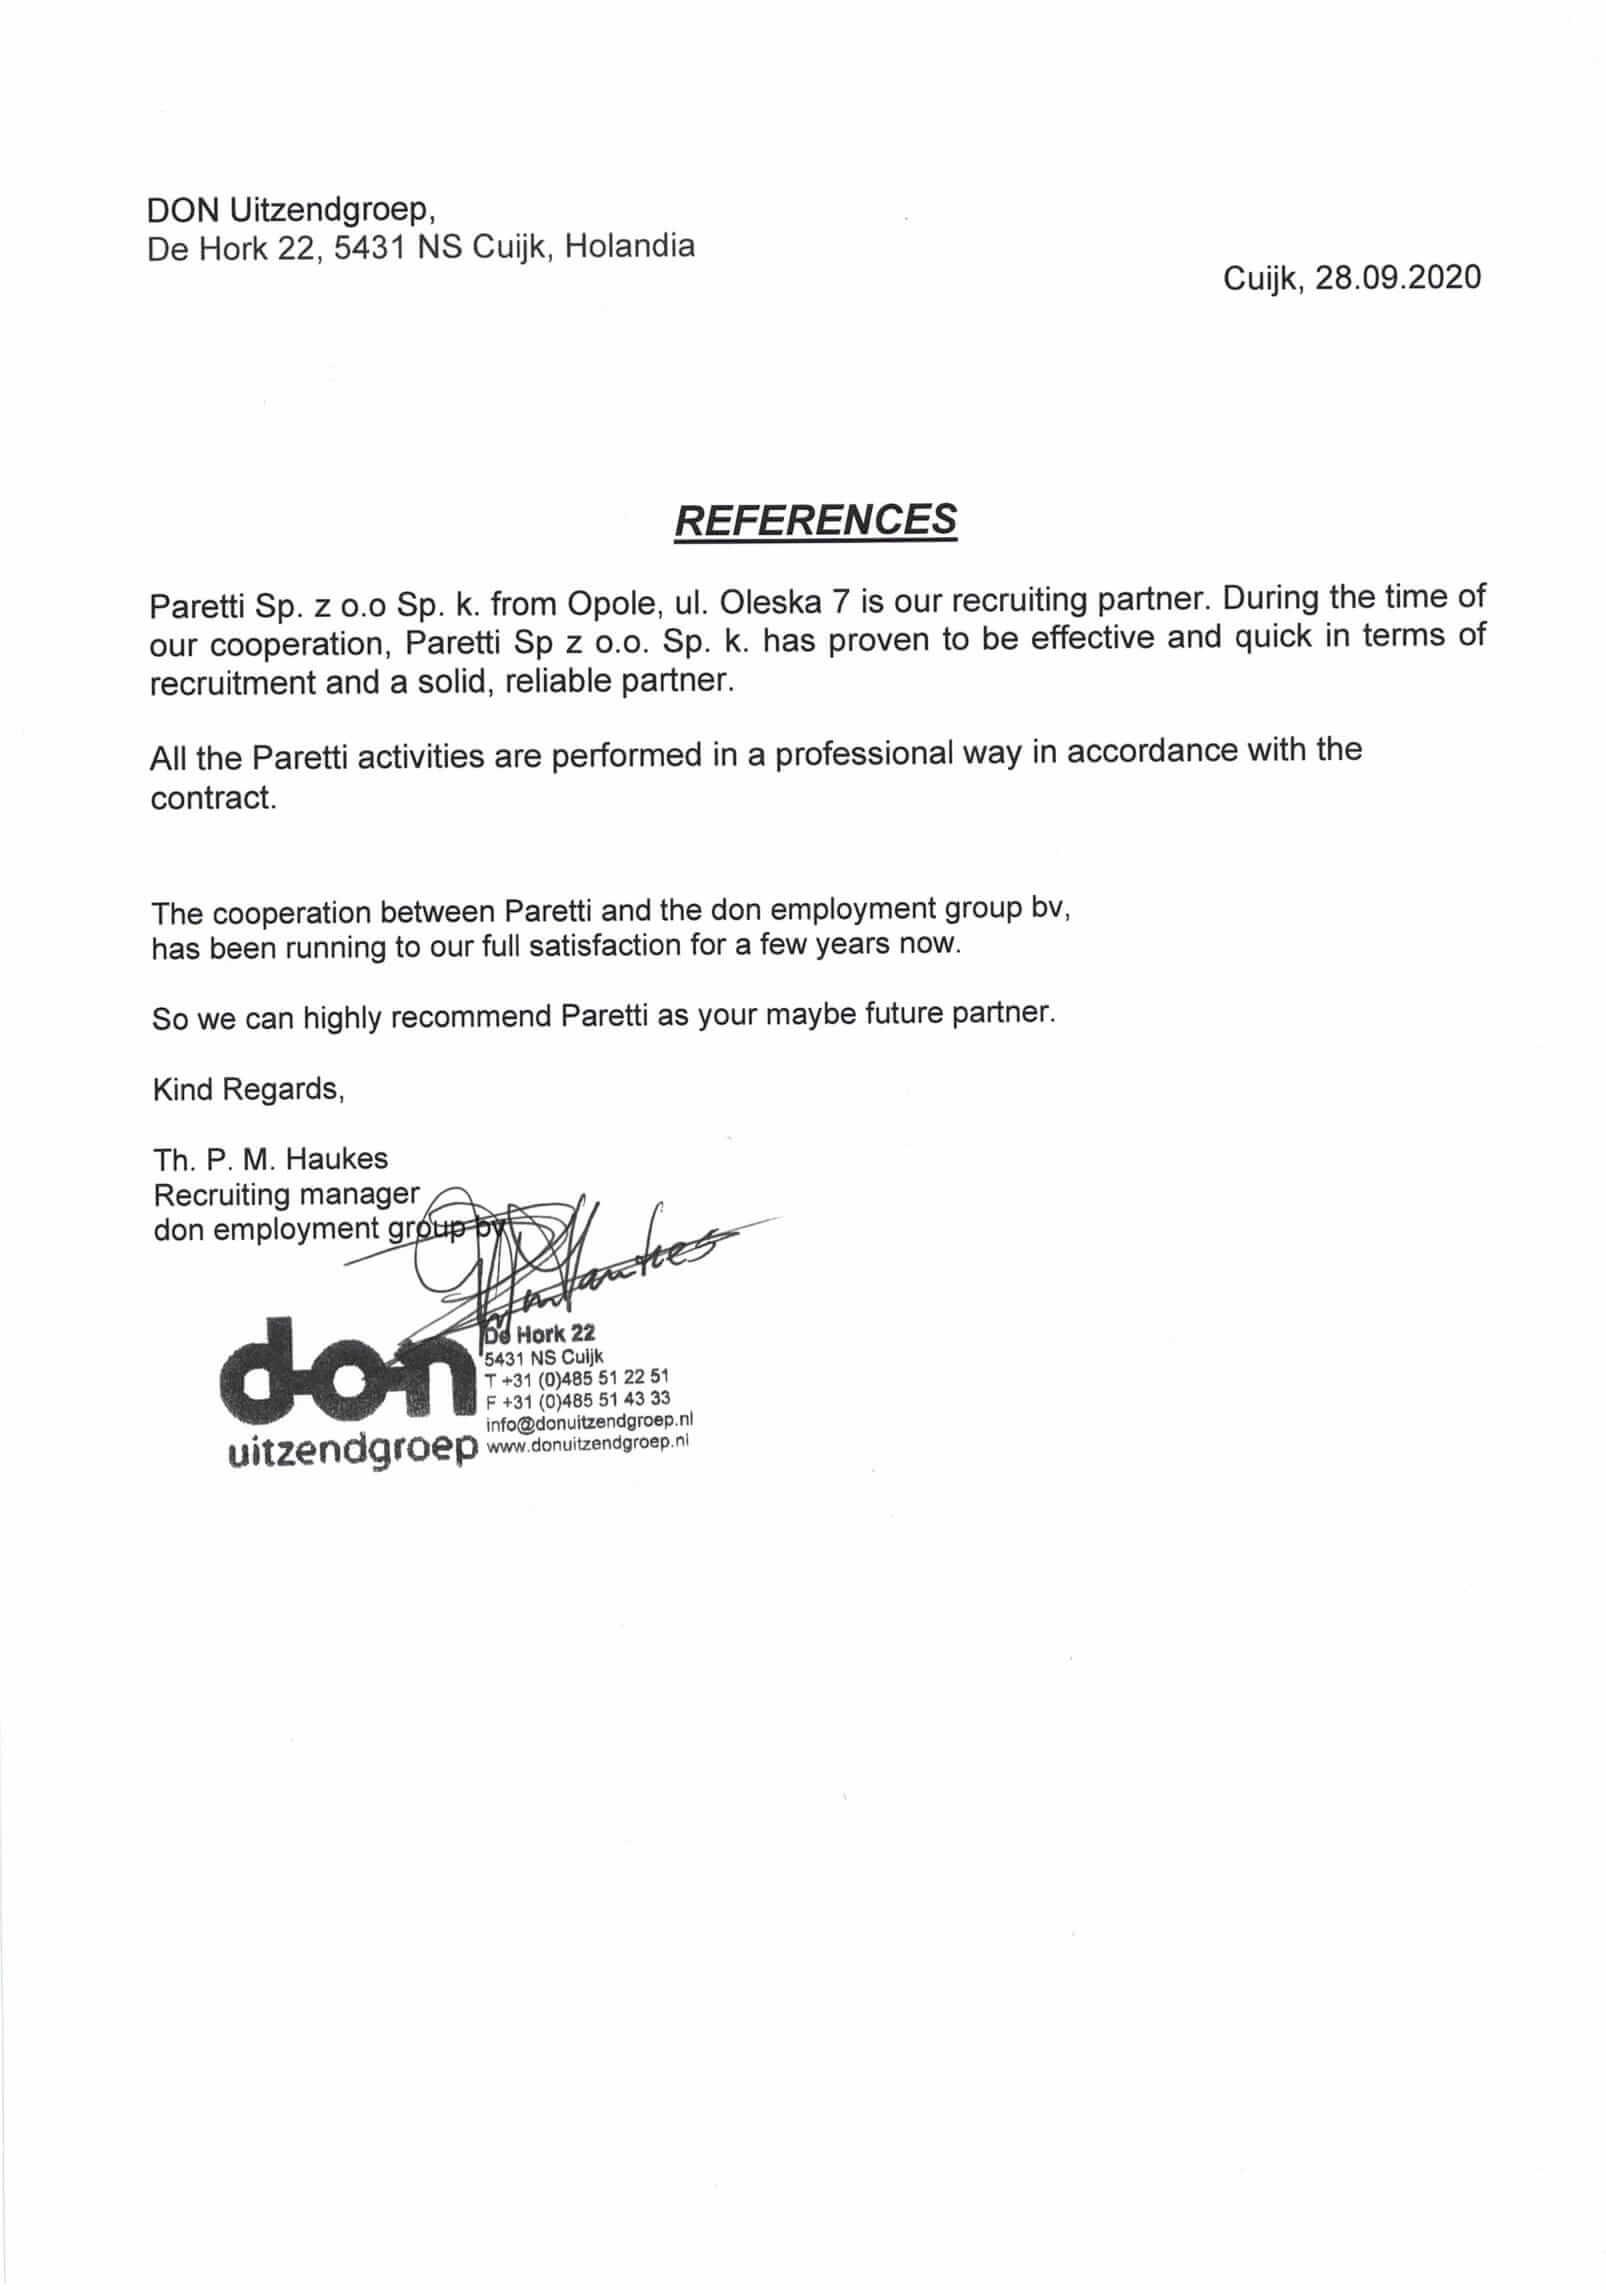 References-don-uitzendgroep-bv-2-1.jpg